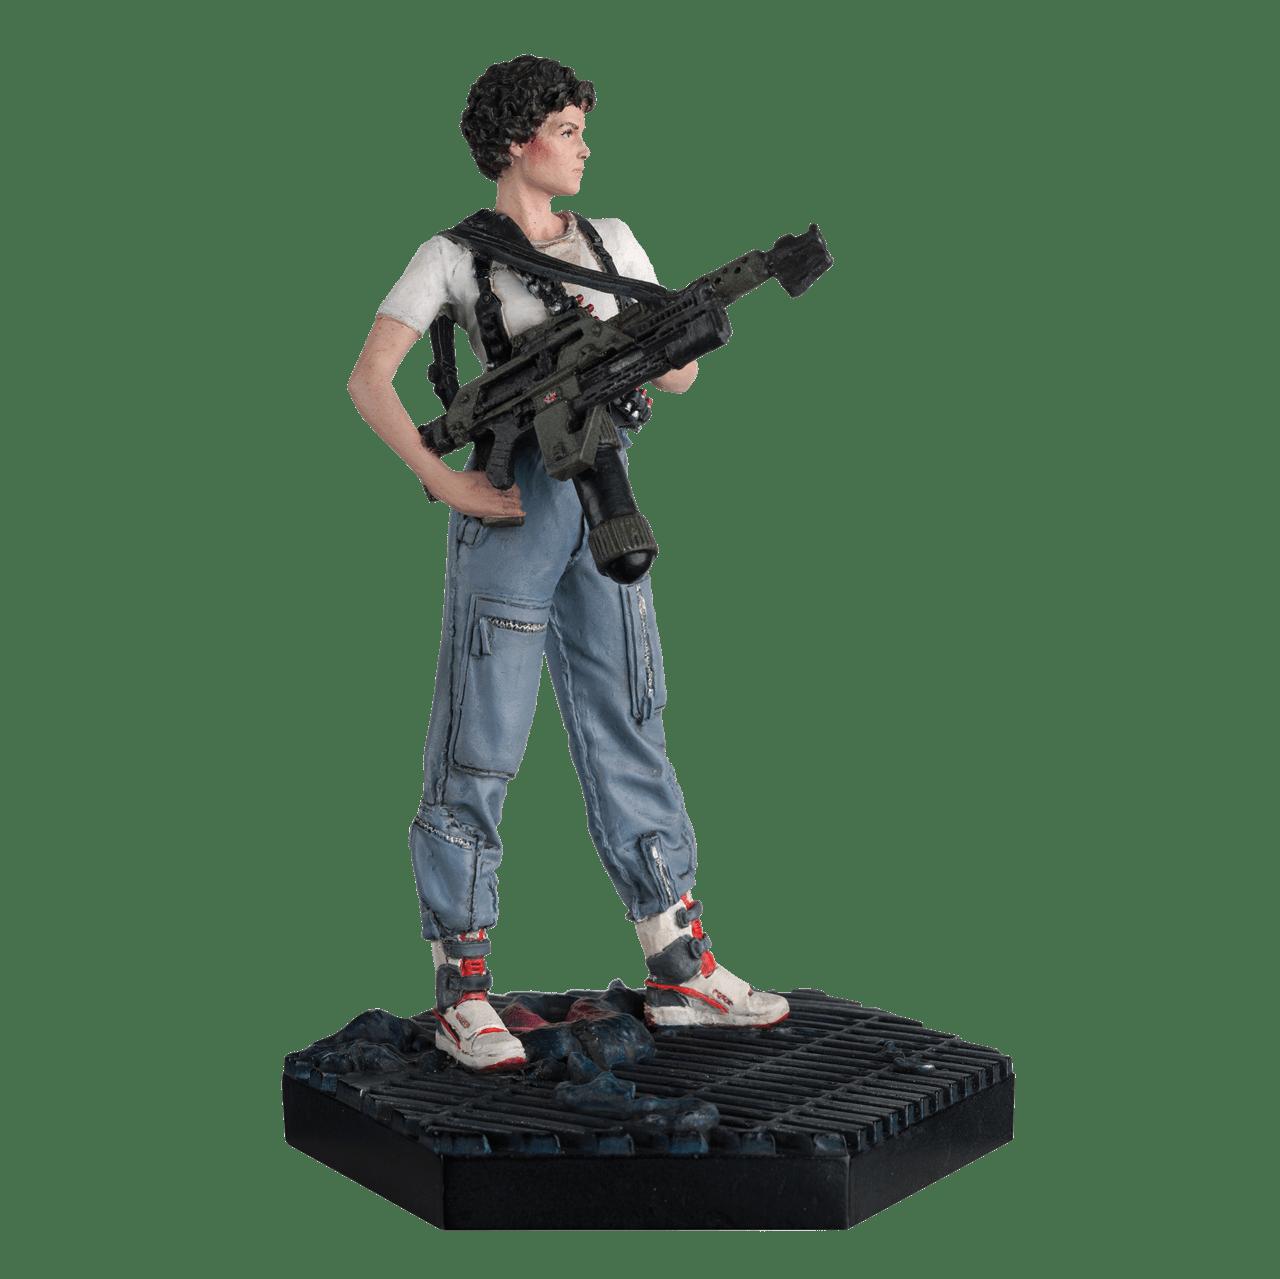 Ripley Alien Figurine: Hero Collector - 2